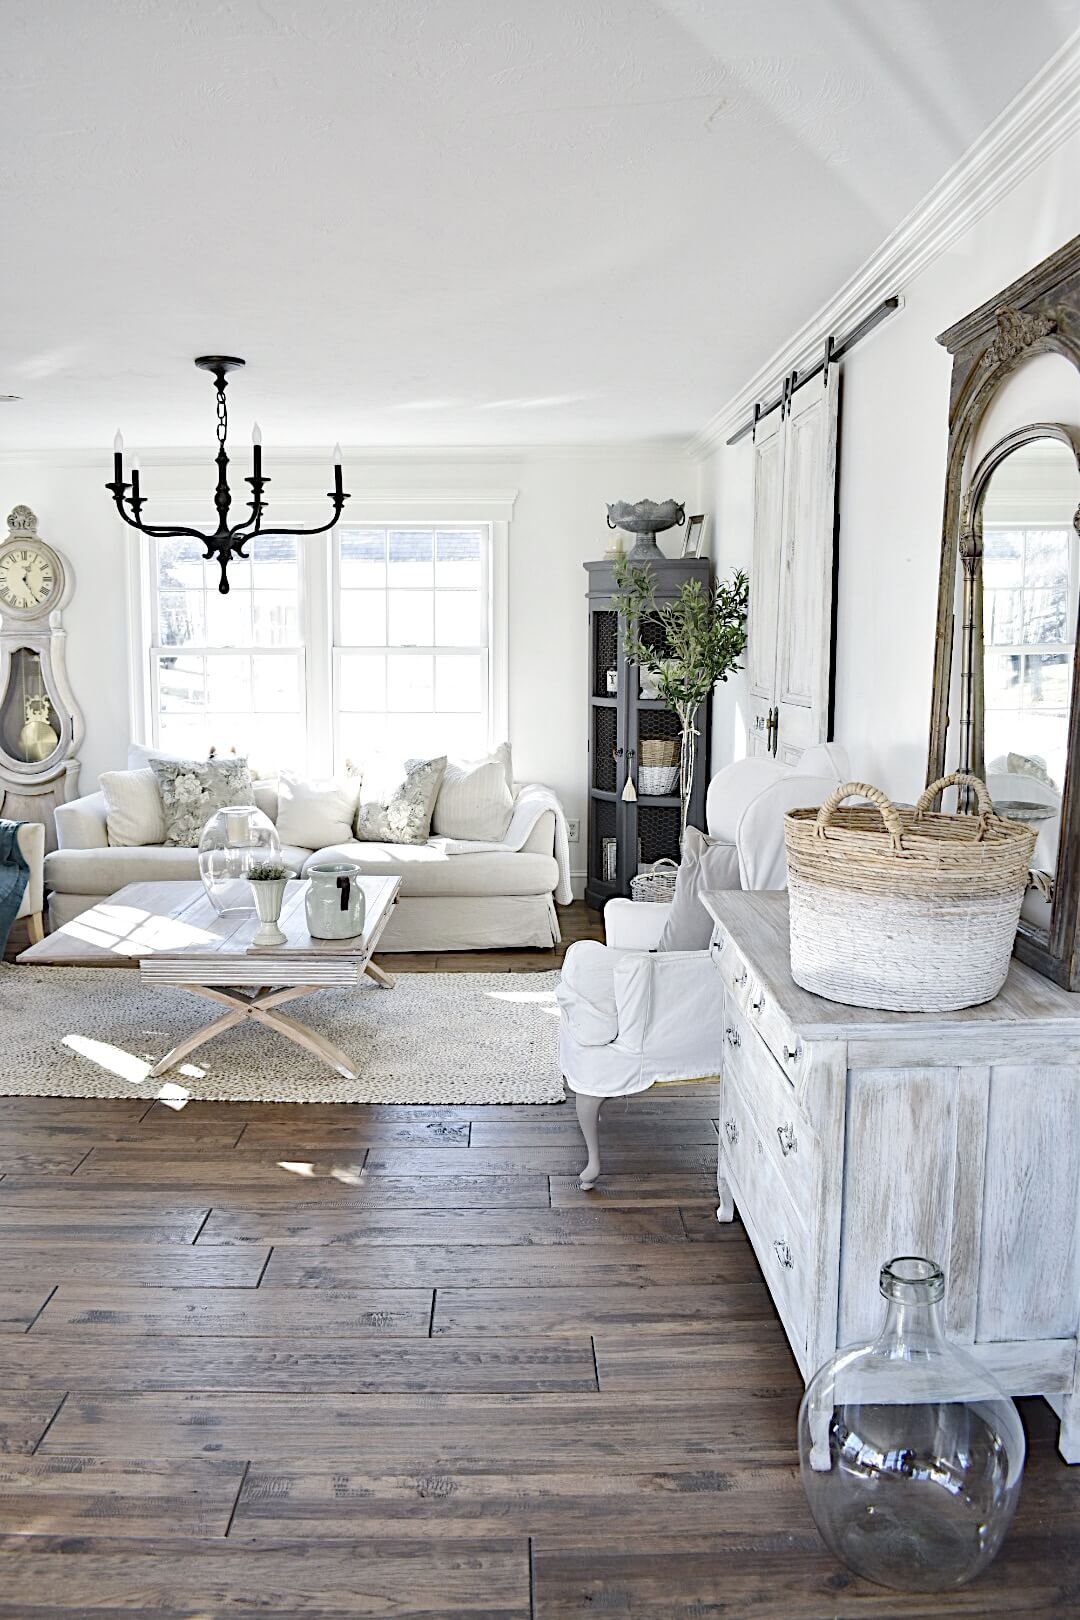 Refinishing furniture for weatherglass living room European farmhouse style